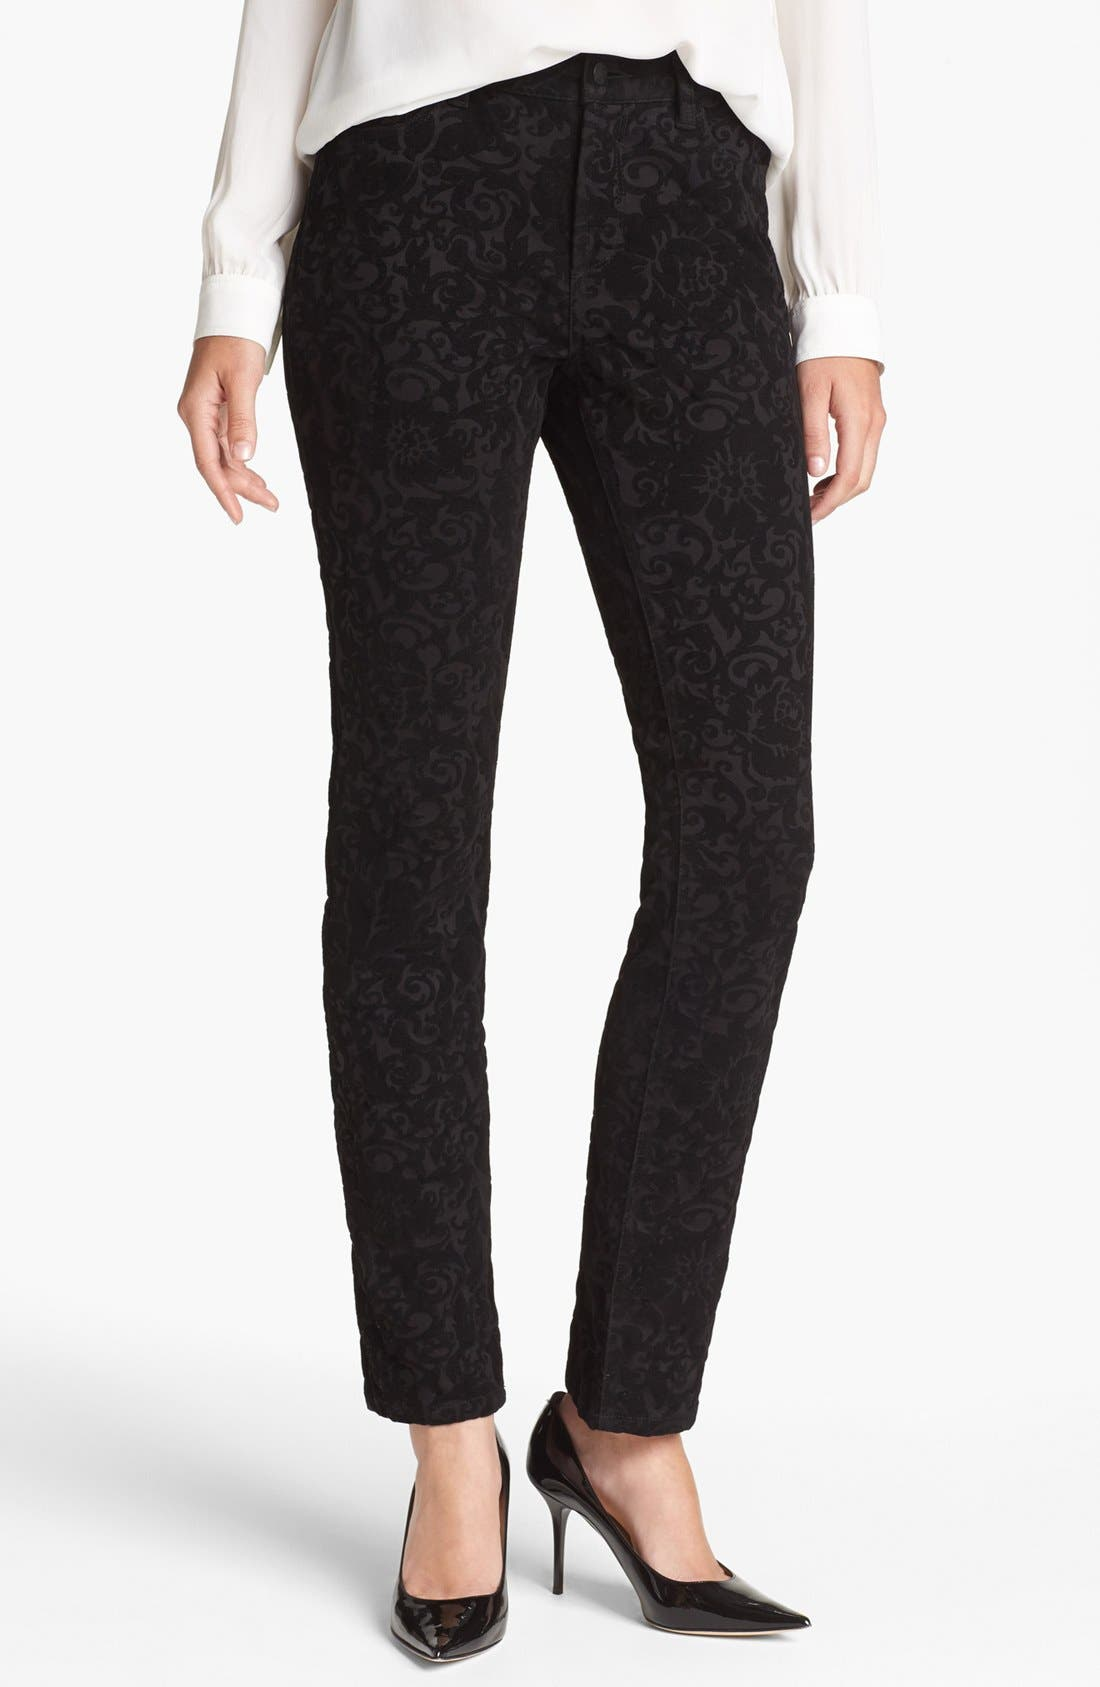 Alternate Image 1 Selected - NYDJ 'Sheri' Flocked Stretch Skinny Jeans